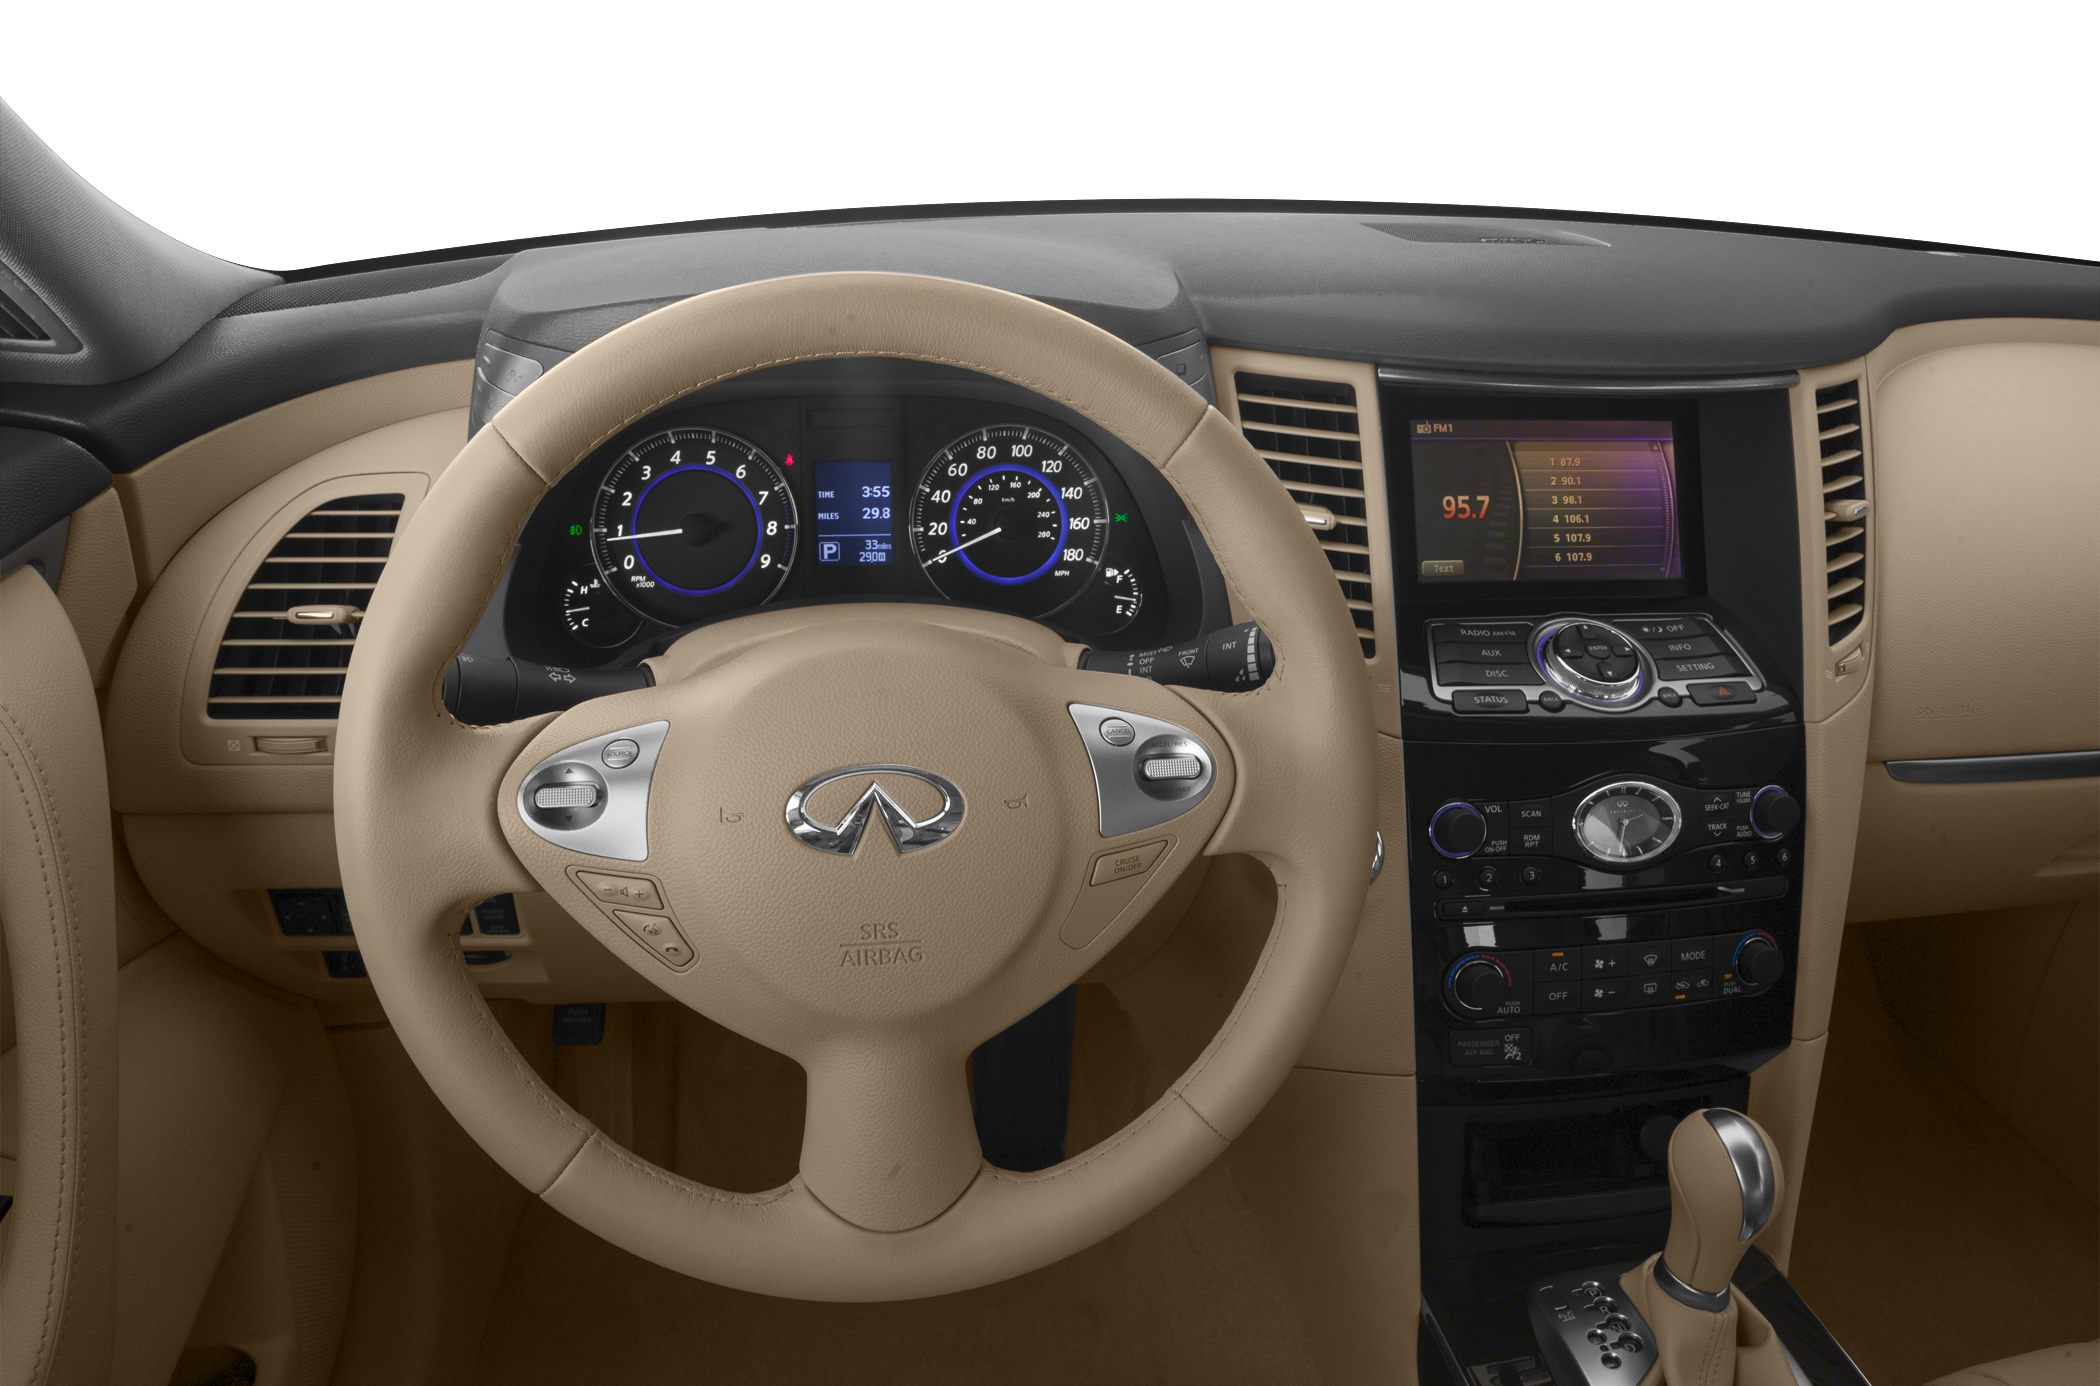 2017 infiniti qx70 deals prices incentives leases overview infiniti qx70 interior vanachro Choice Image